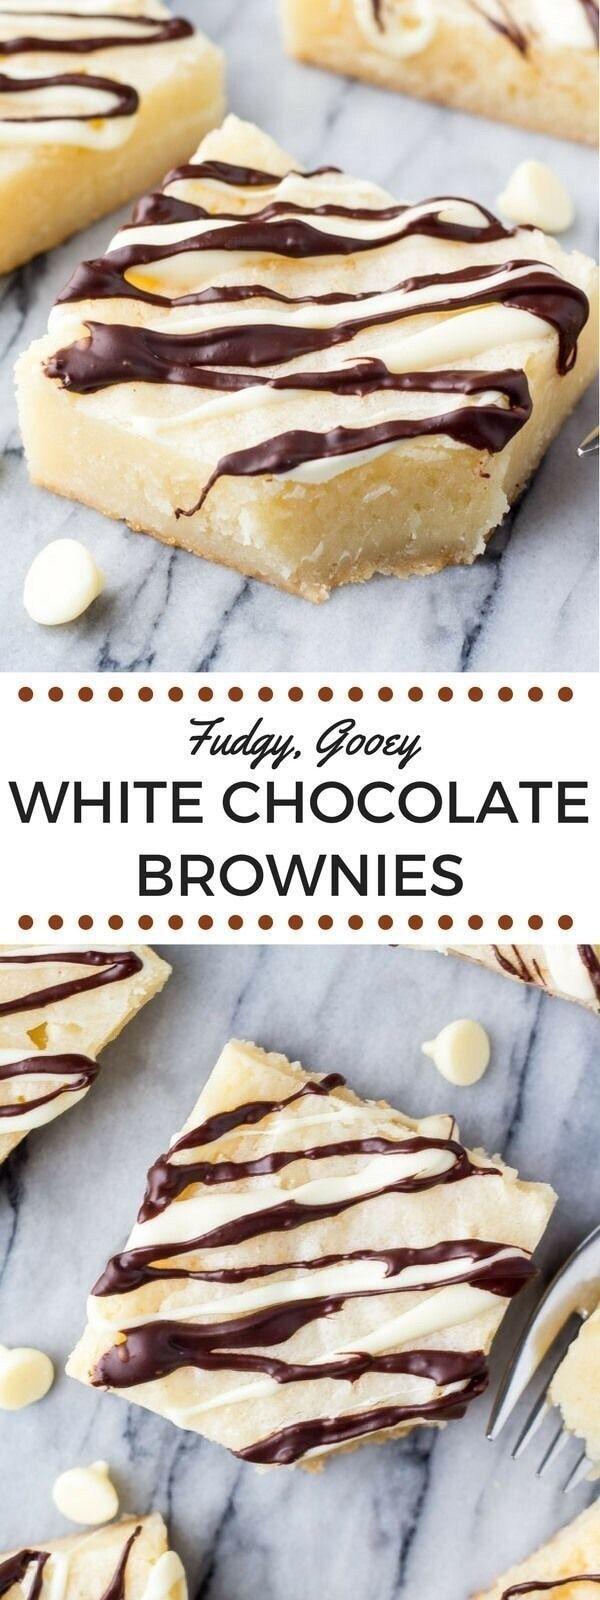 26 Wonderful White Chocolate Desserts